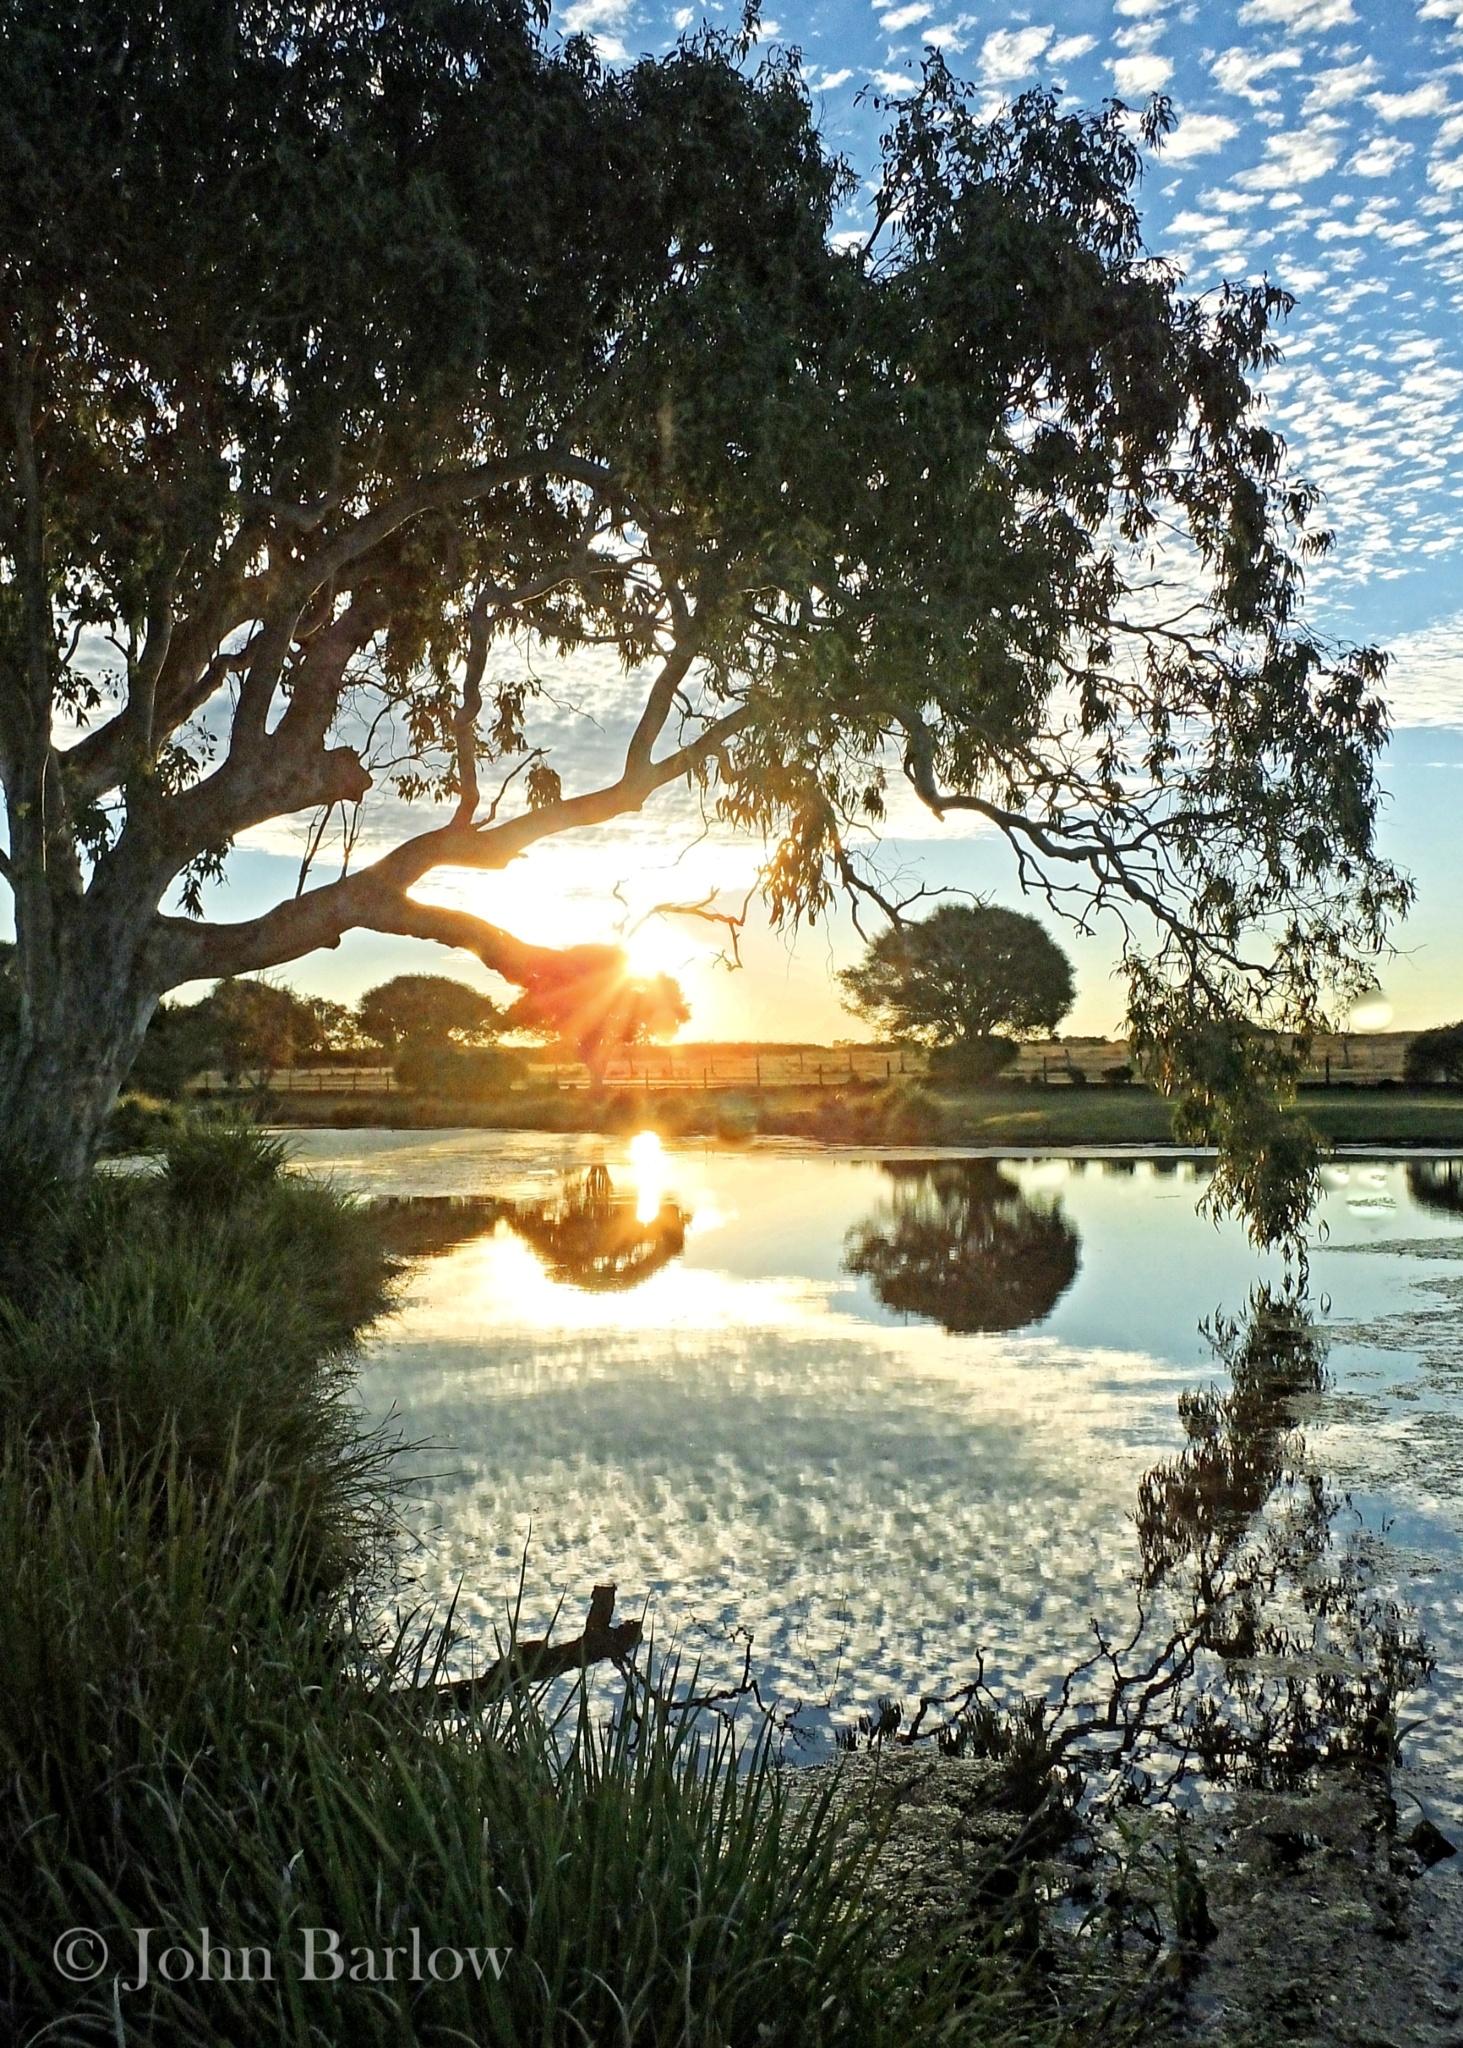 Sunset Over The Billabong by John Barlow